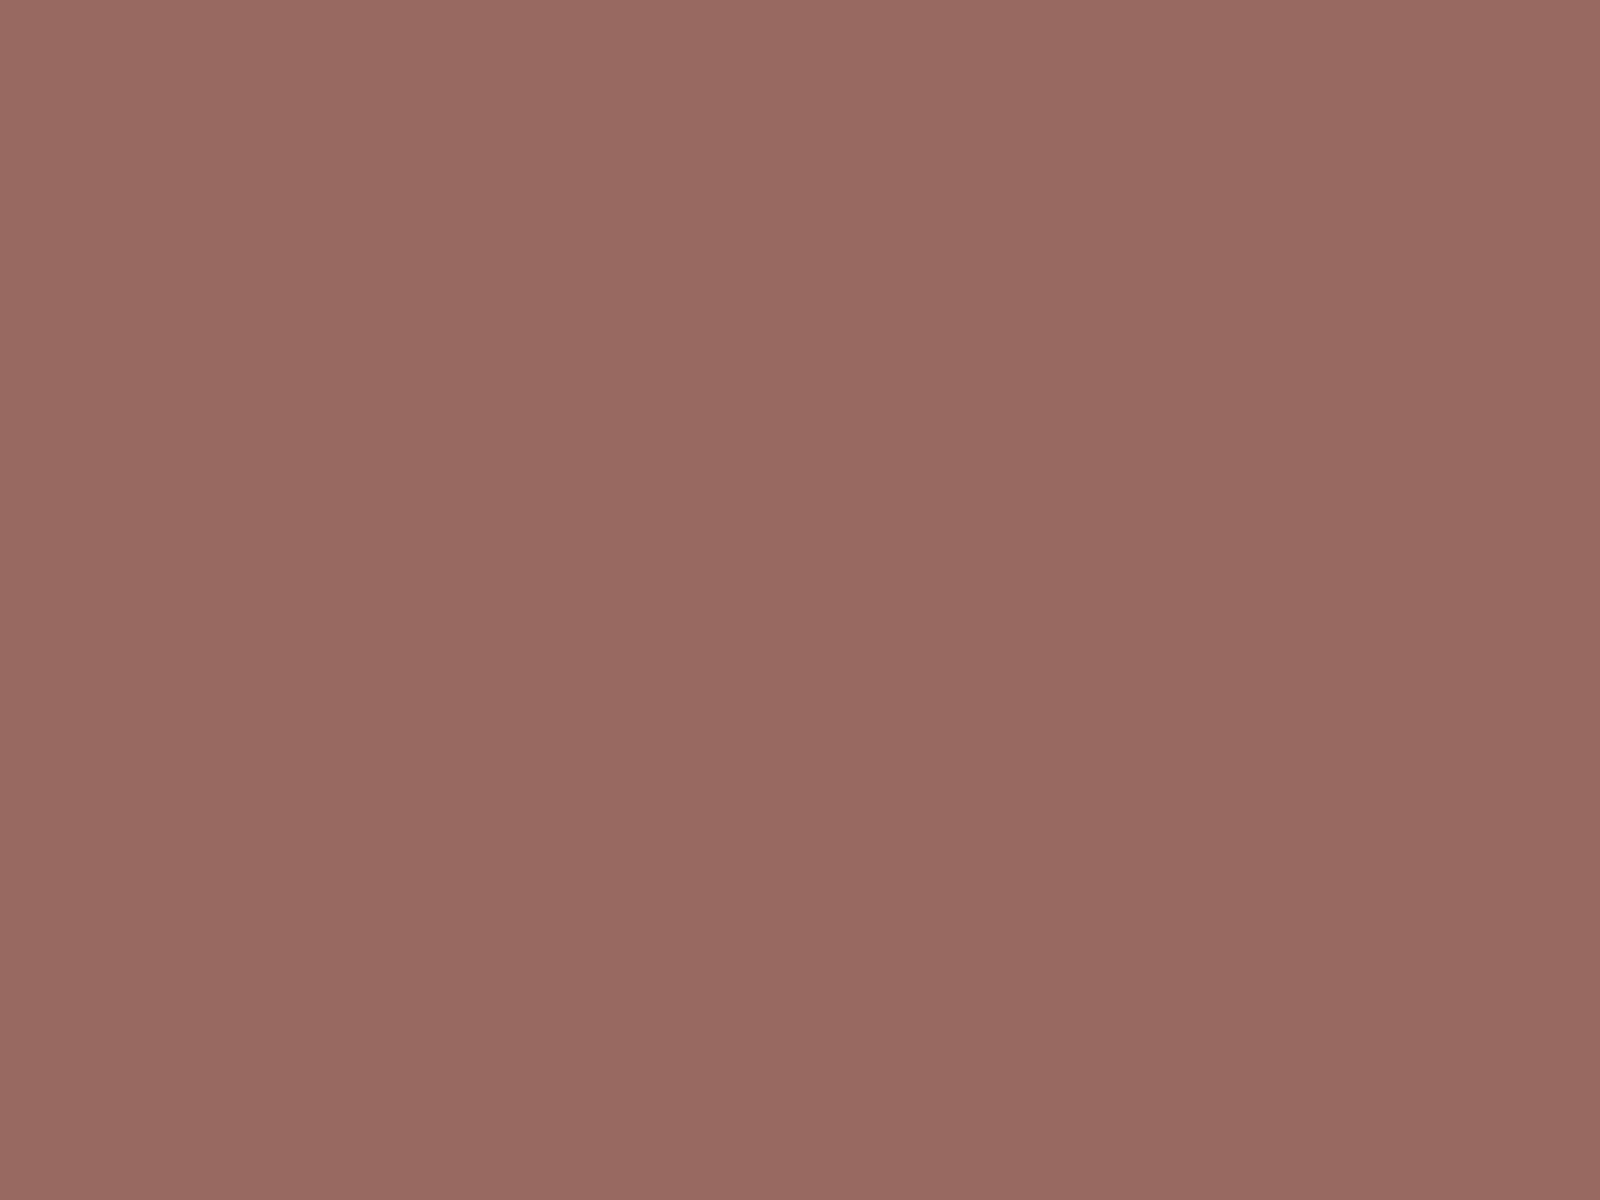 1600x1200 Dark Chestnut Solid Color Background